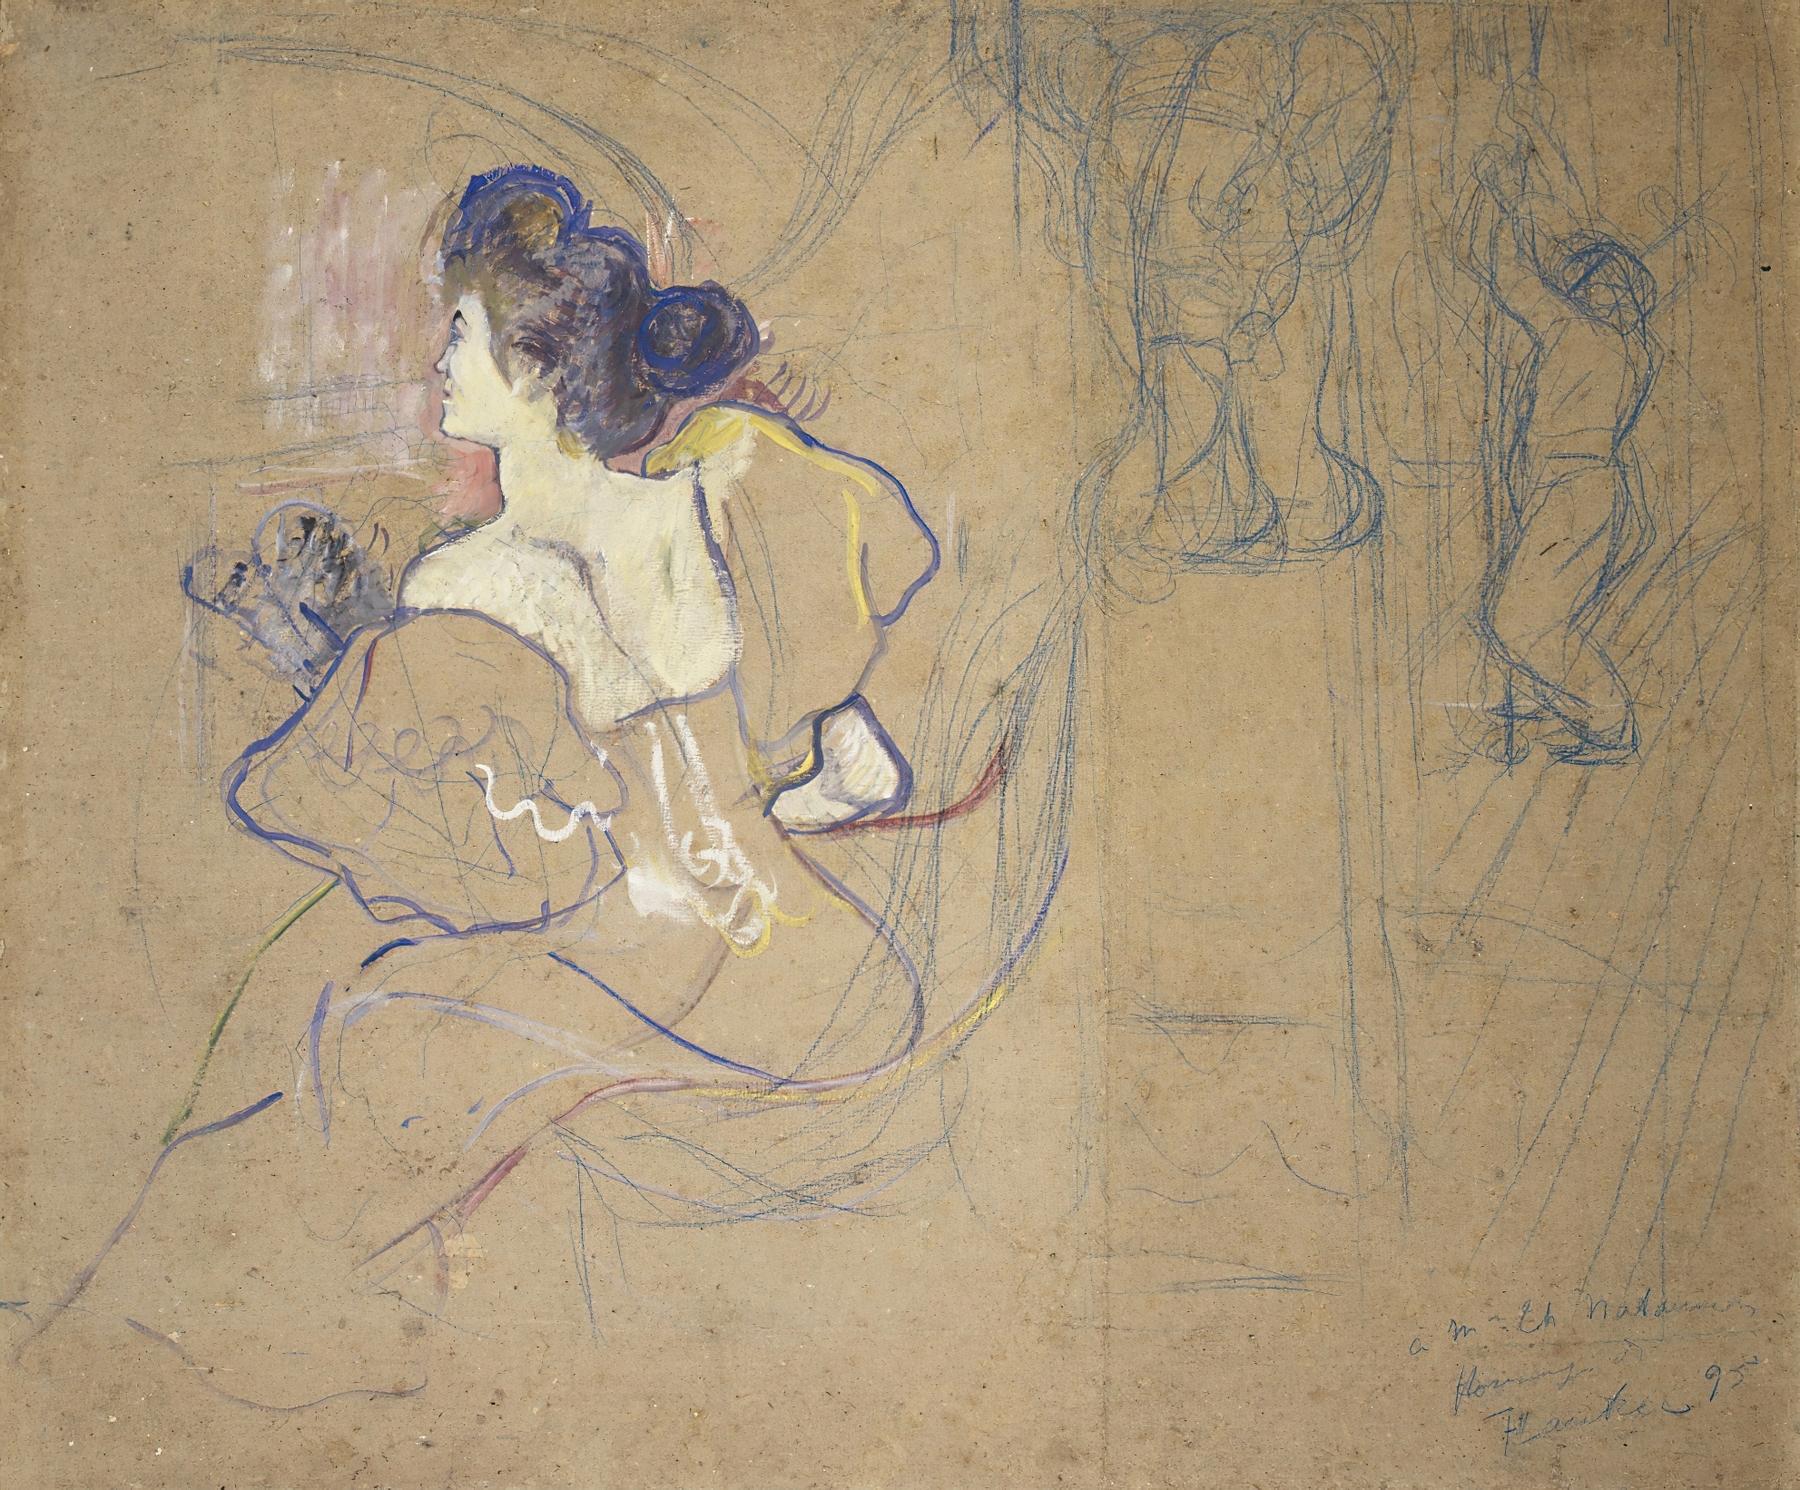 Henri de Toulouse-Lautrec - Madame Thadée Natanson (Misia Godebska, 1872–1950) at the Theater